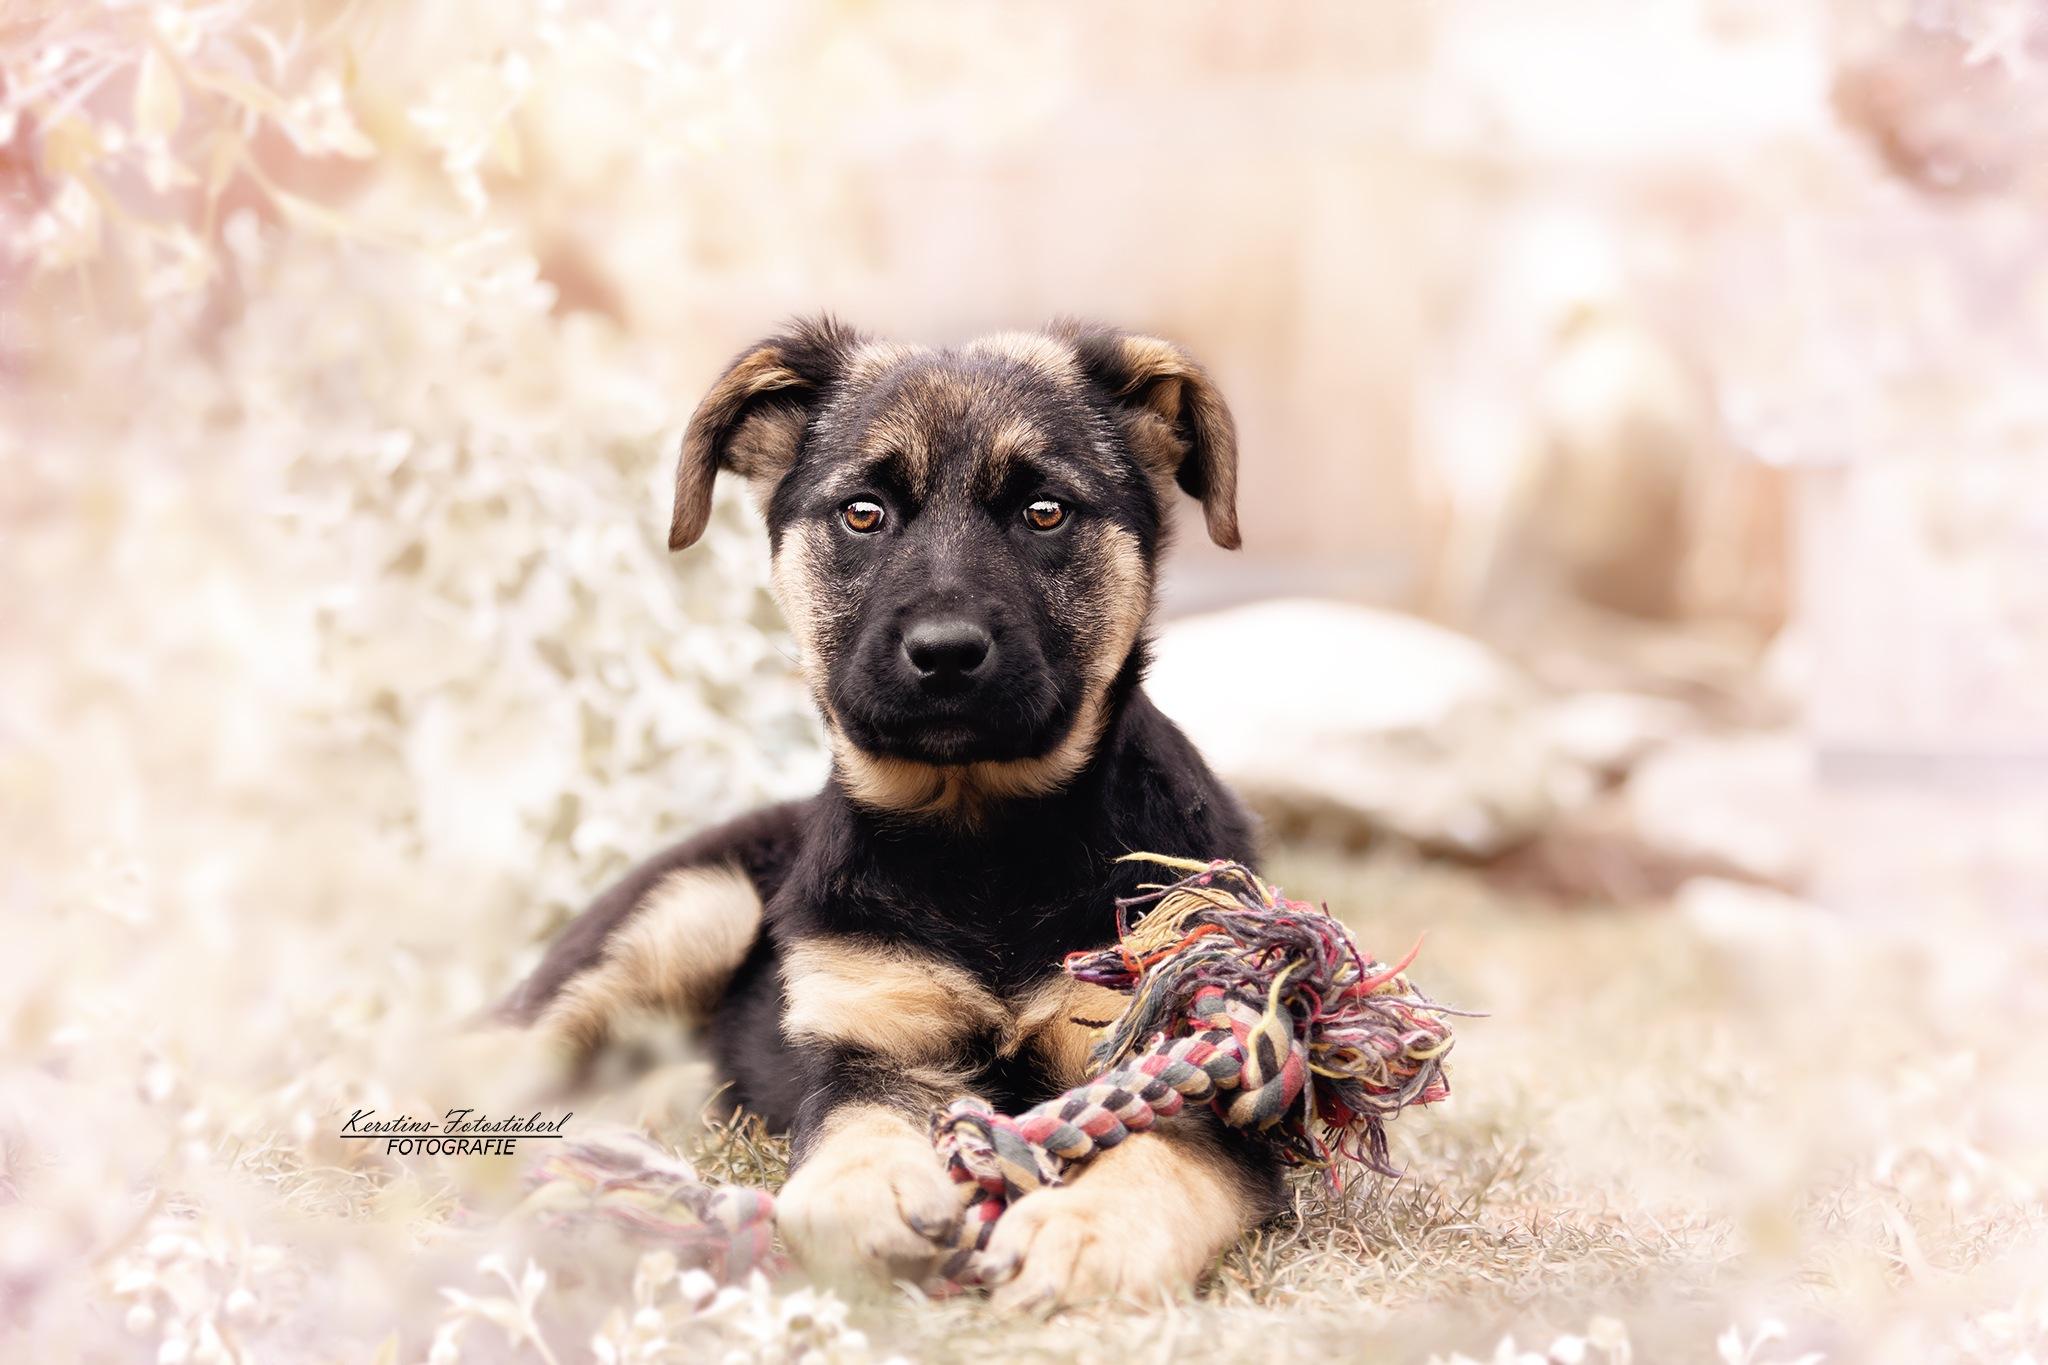 Puppy  by KerstinsFotostueberl